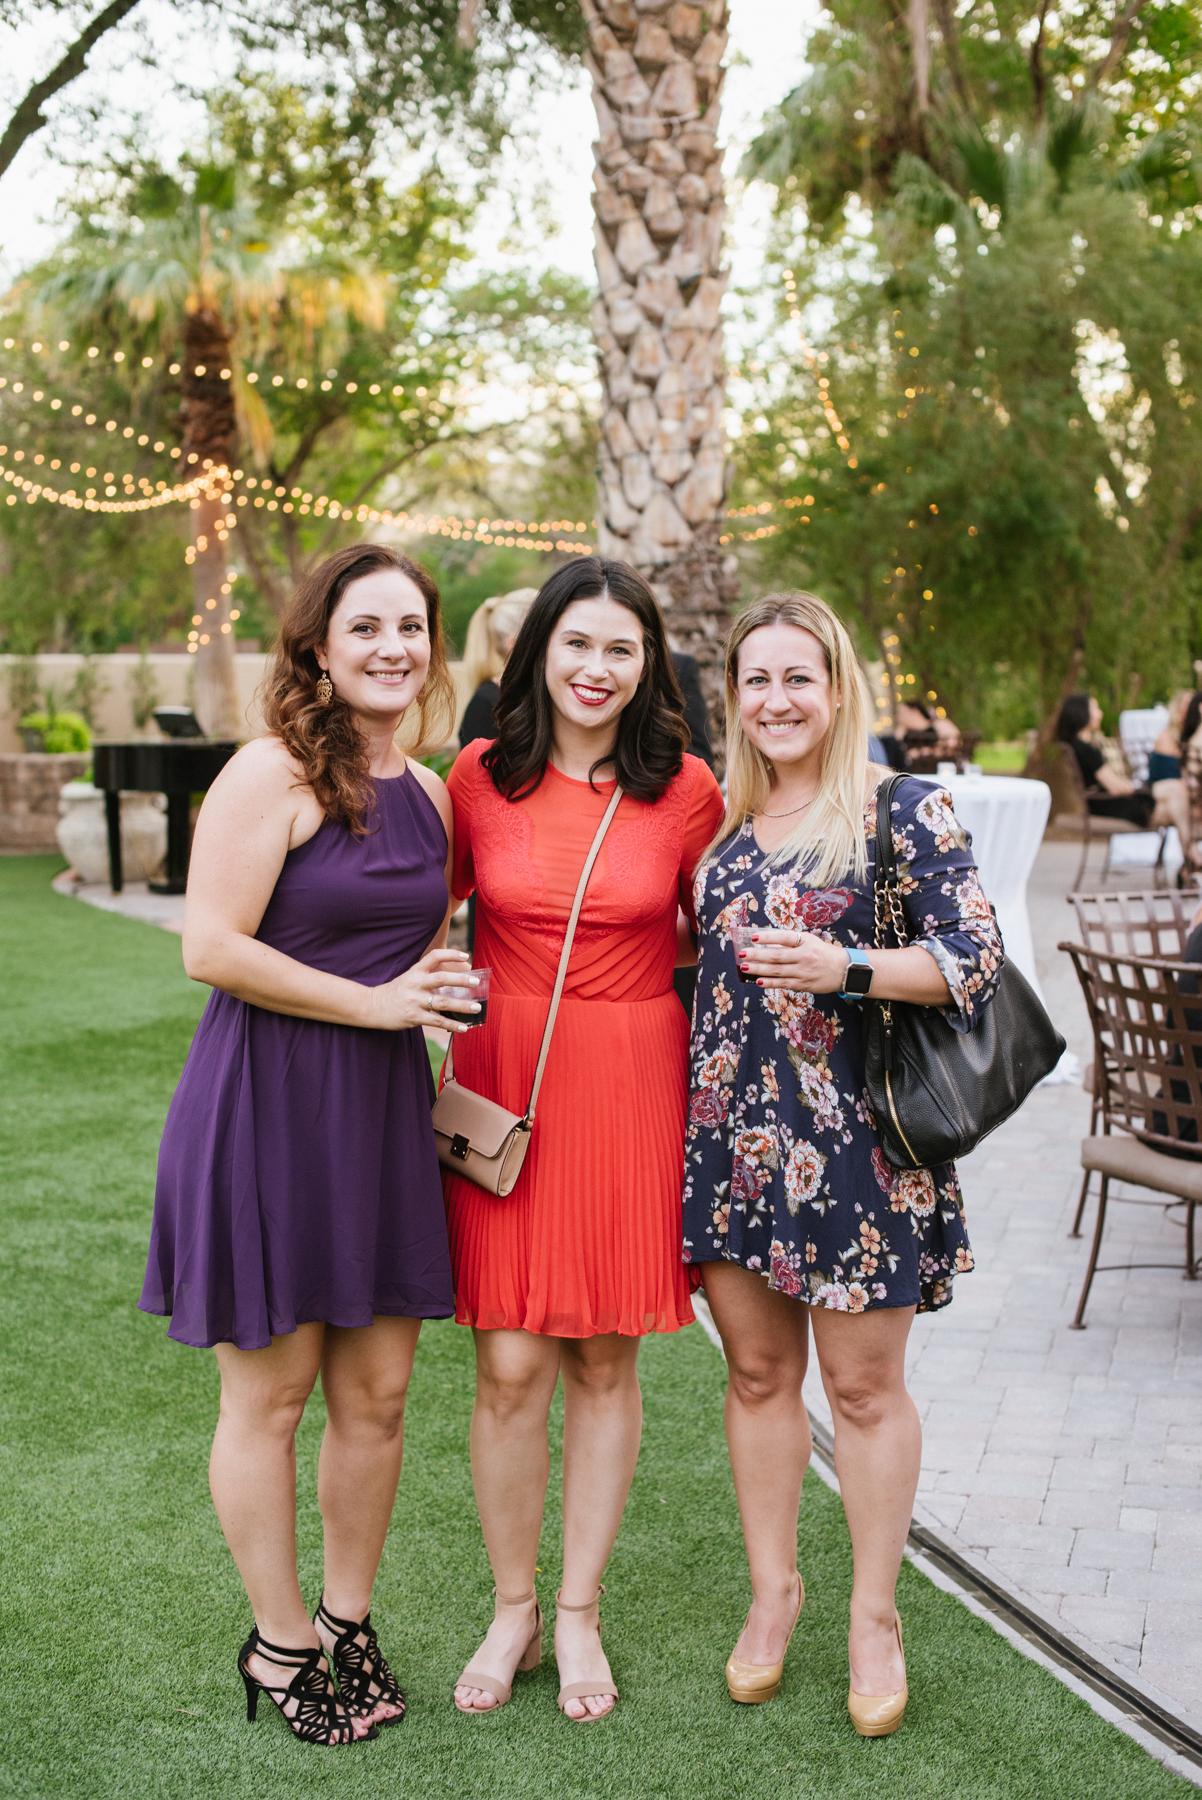 Secret Garden Event Center Wedding - Meredith Amadee Photography-1-8.jpg